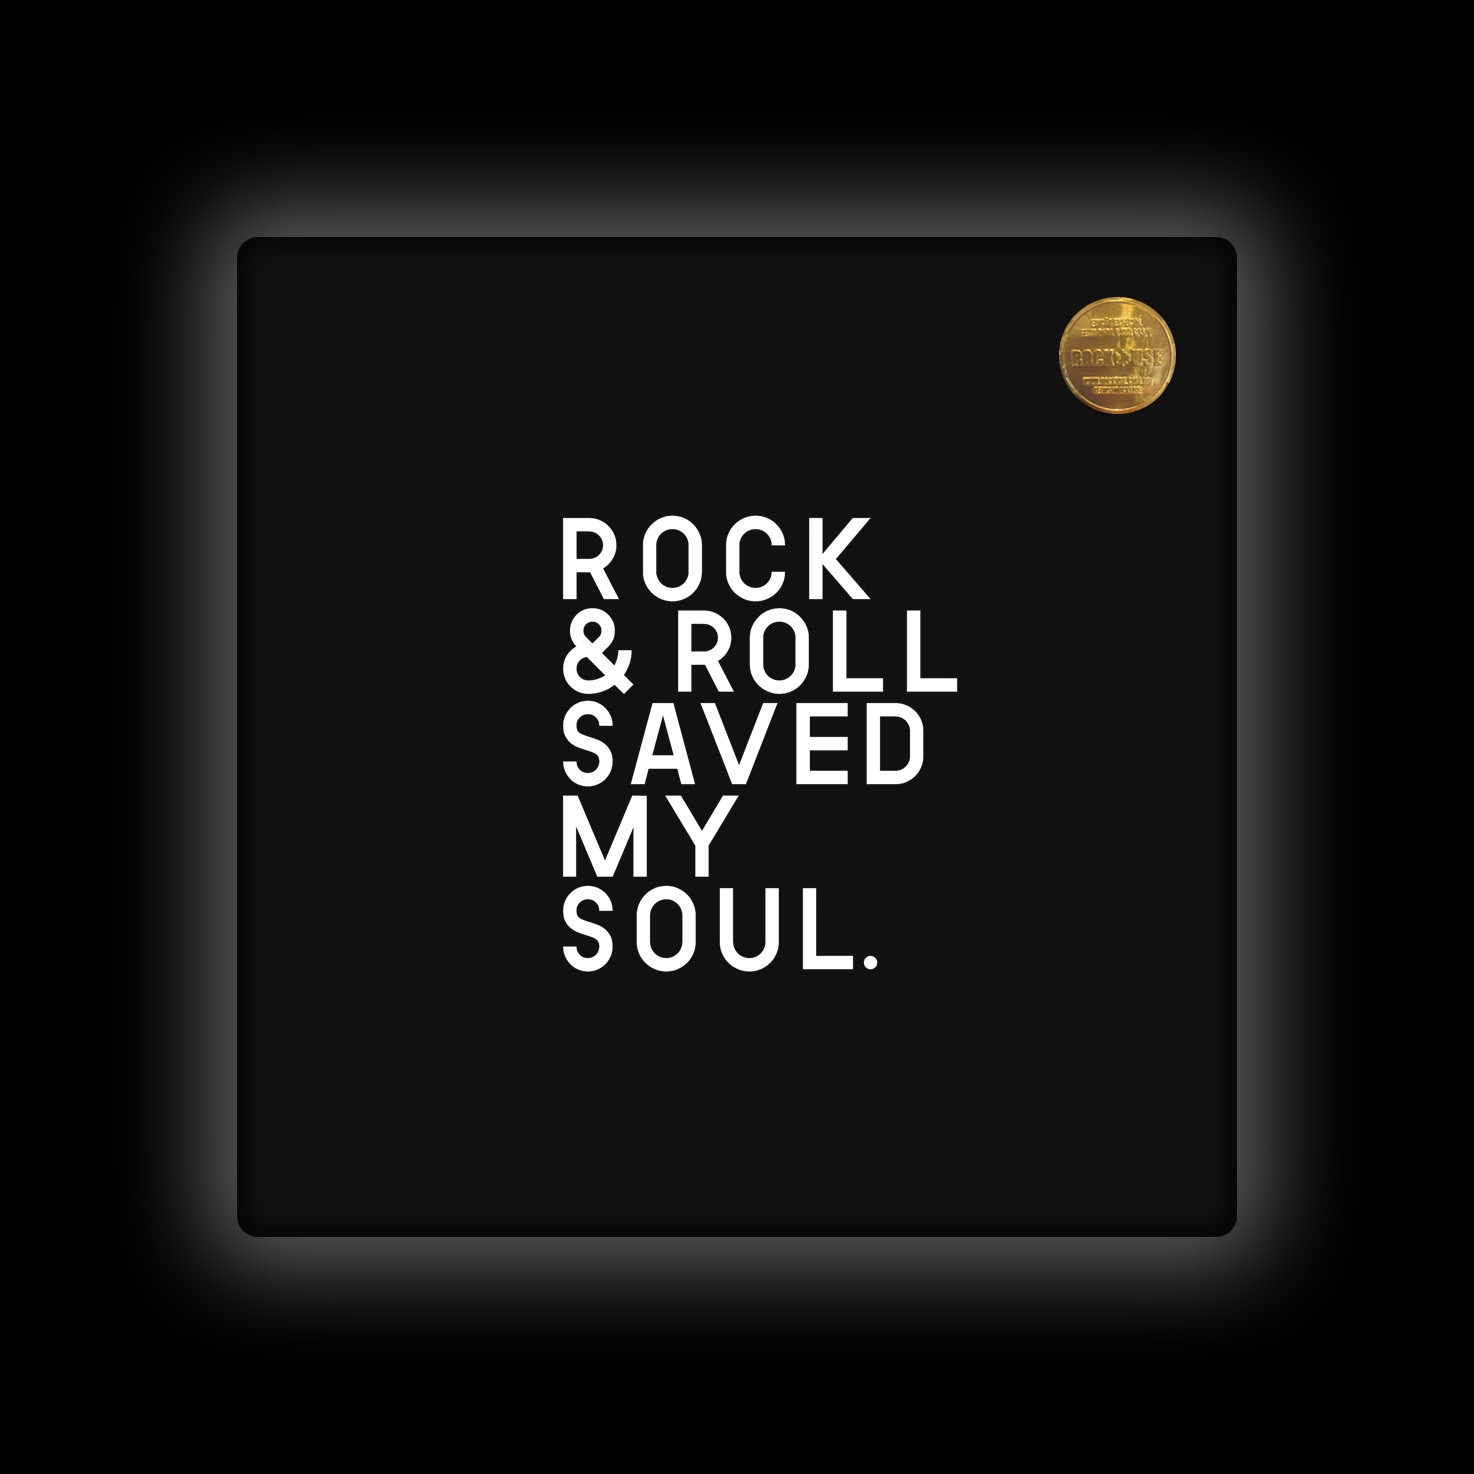 Capa de Almofada Rock Use - Rock & Roll Saved My Soul - Preta